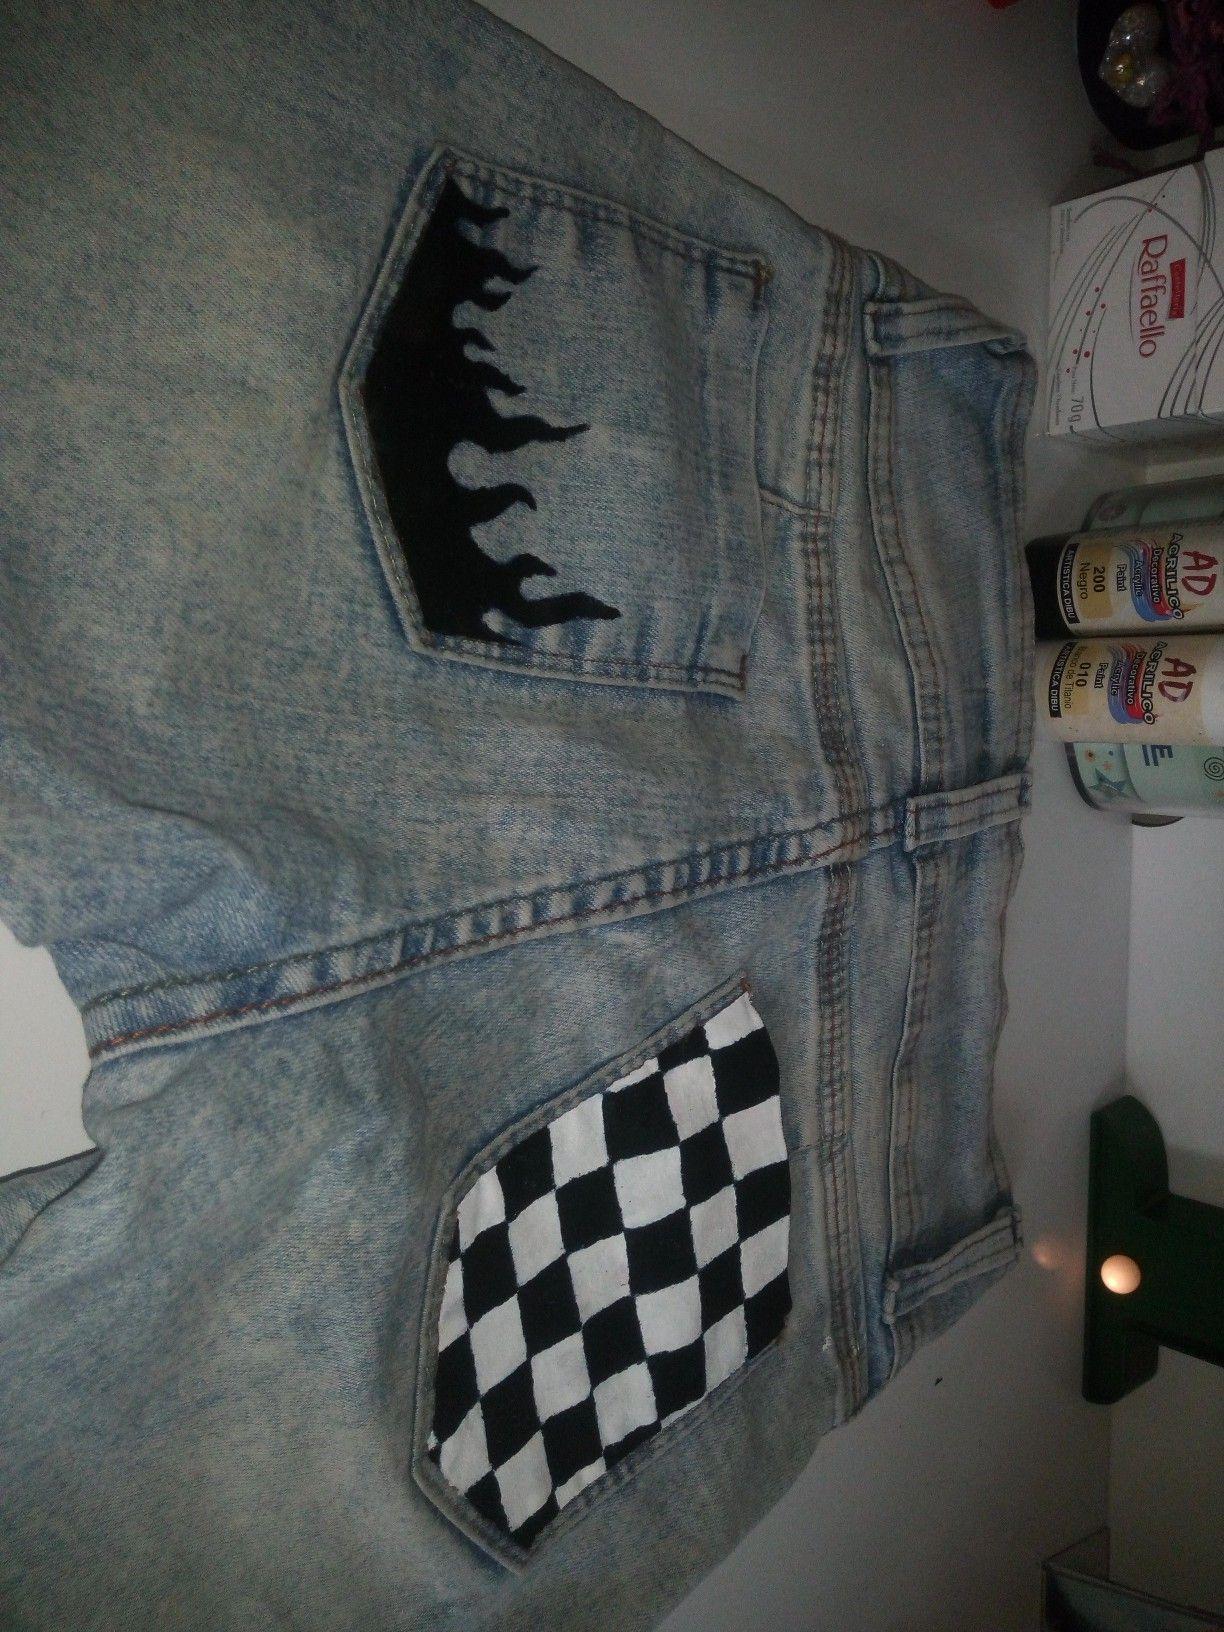 Pin de Karla Sánchez en jeans pintados en 2020 | Pintura ...